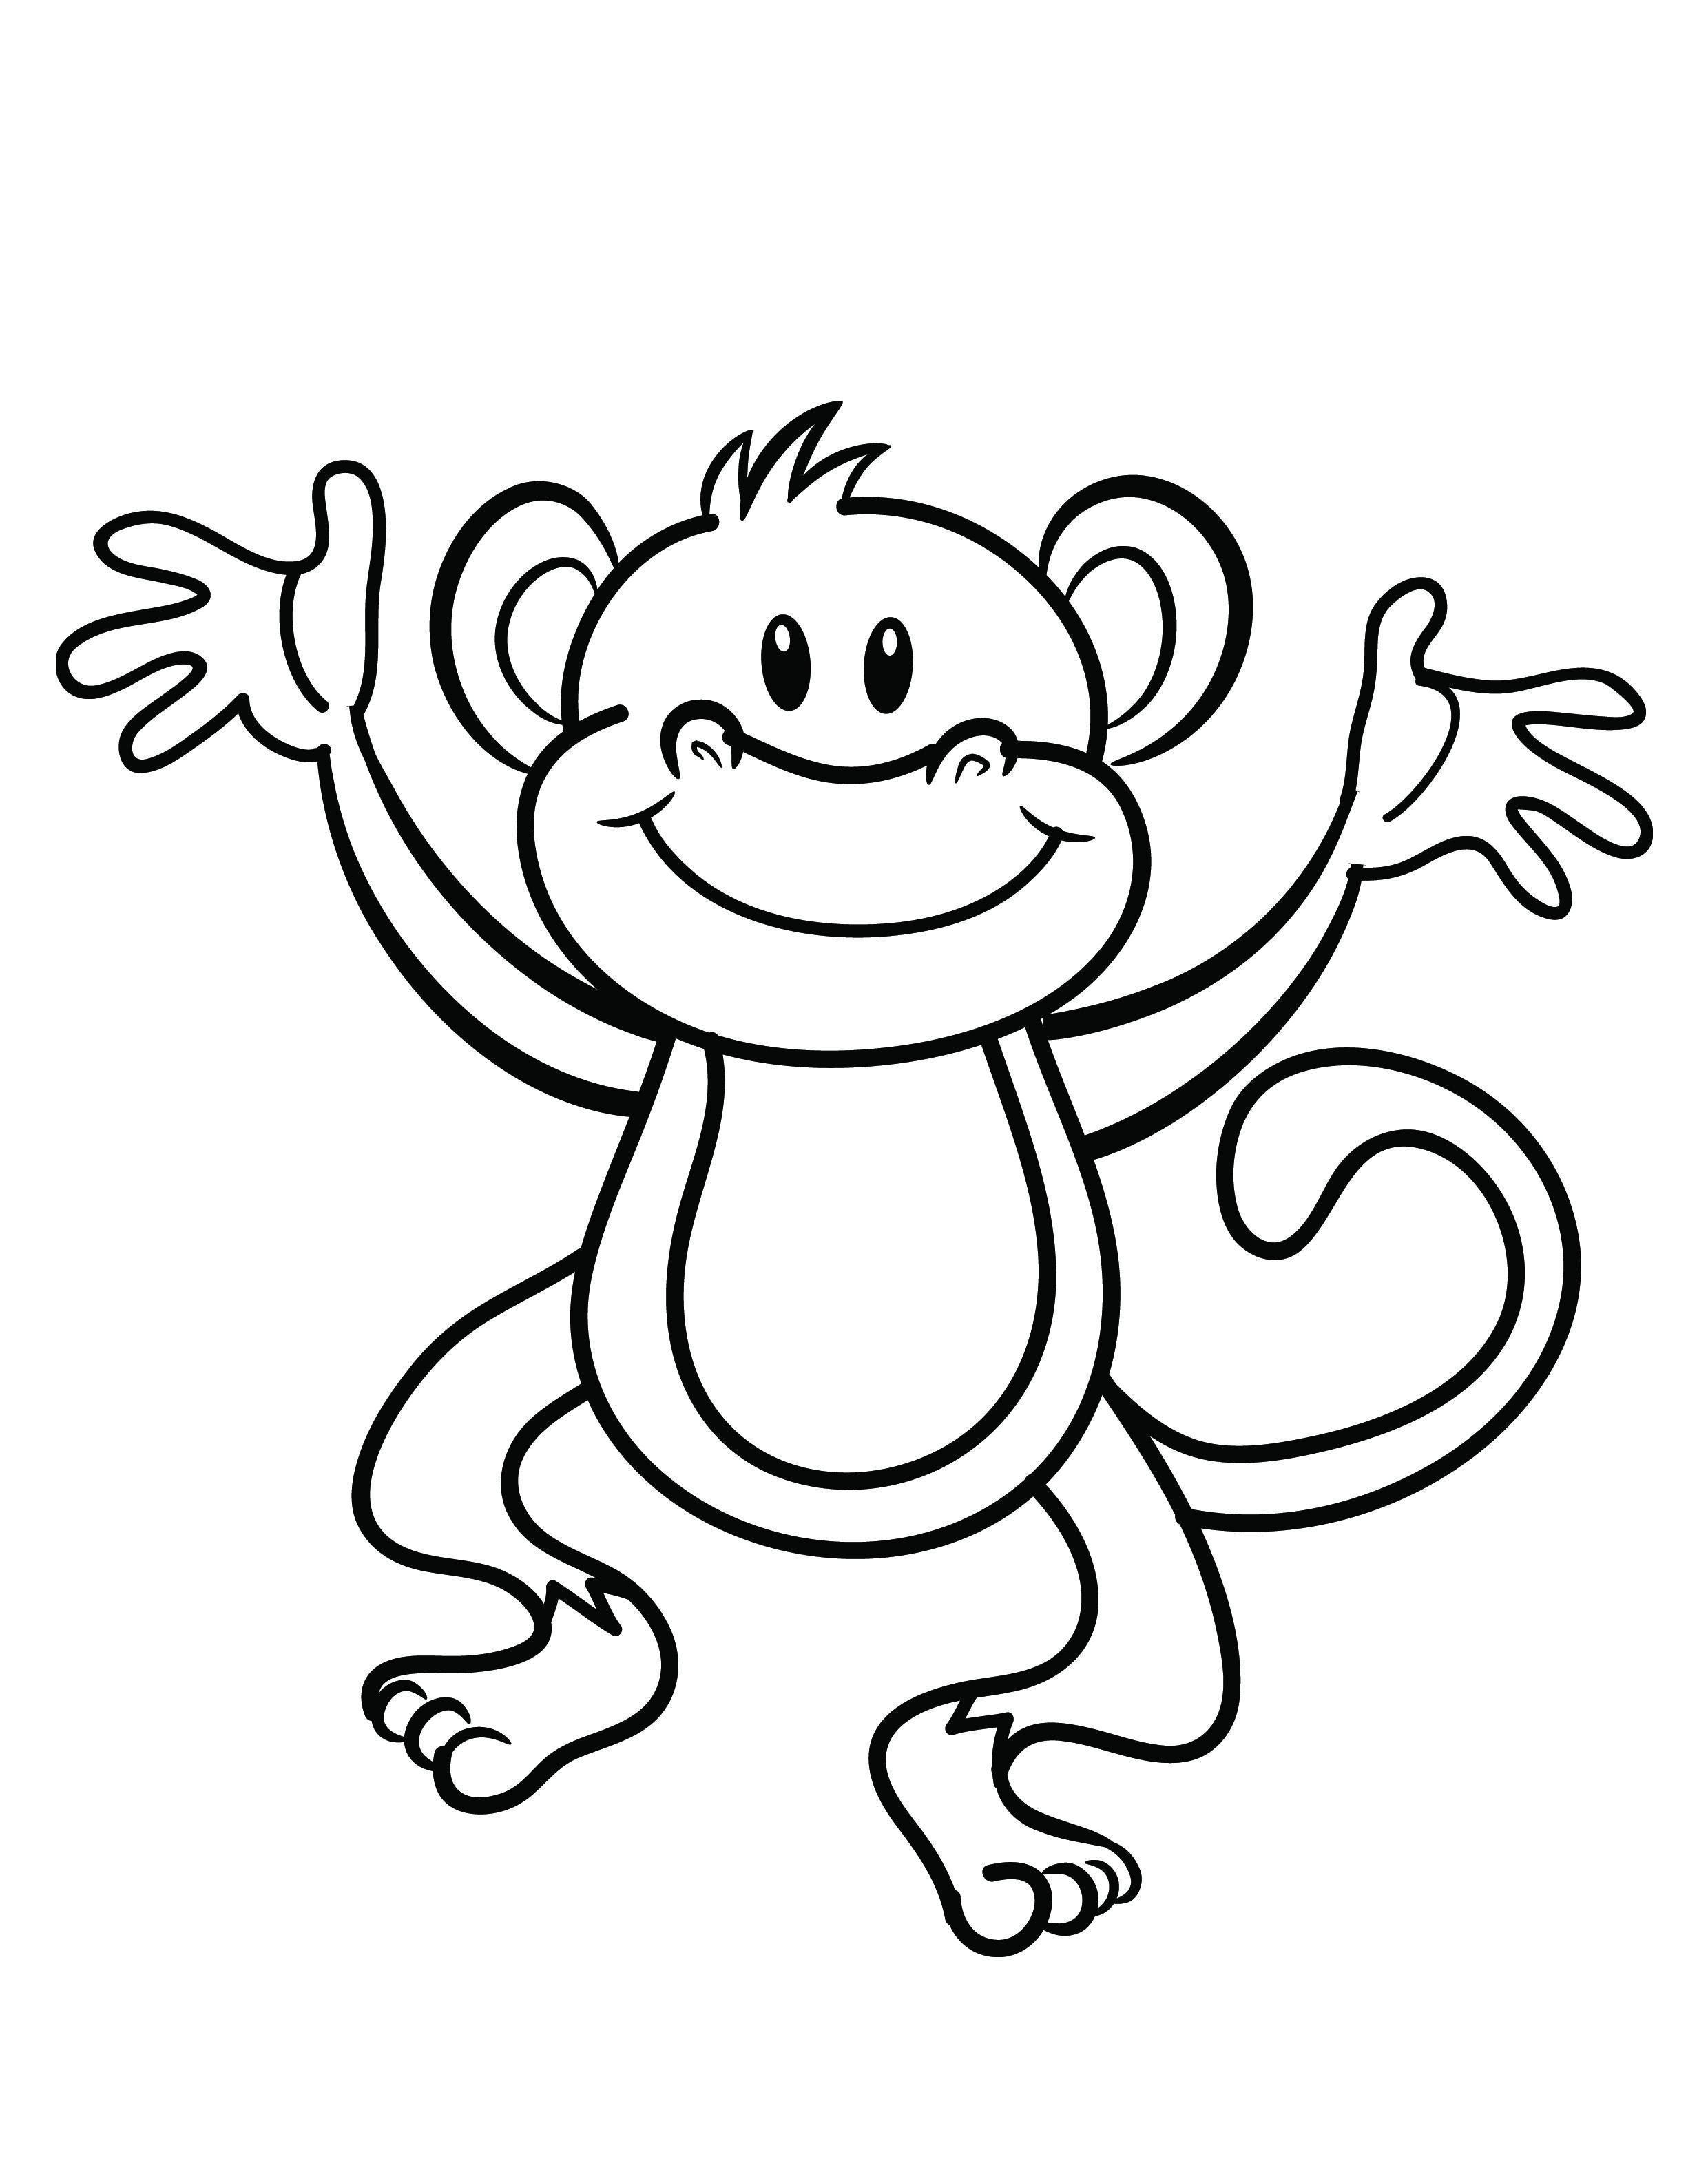 Monkey Coloring | Coloring Page | Monkey Coloring Pages, Monkey - Free Printable Monkey Coloring Pages